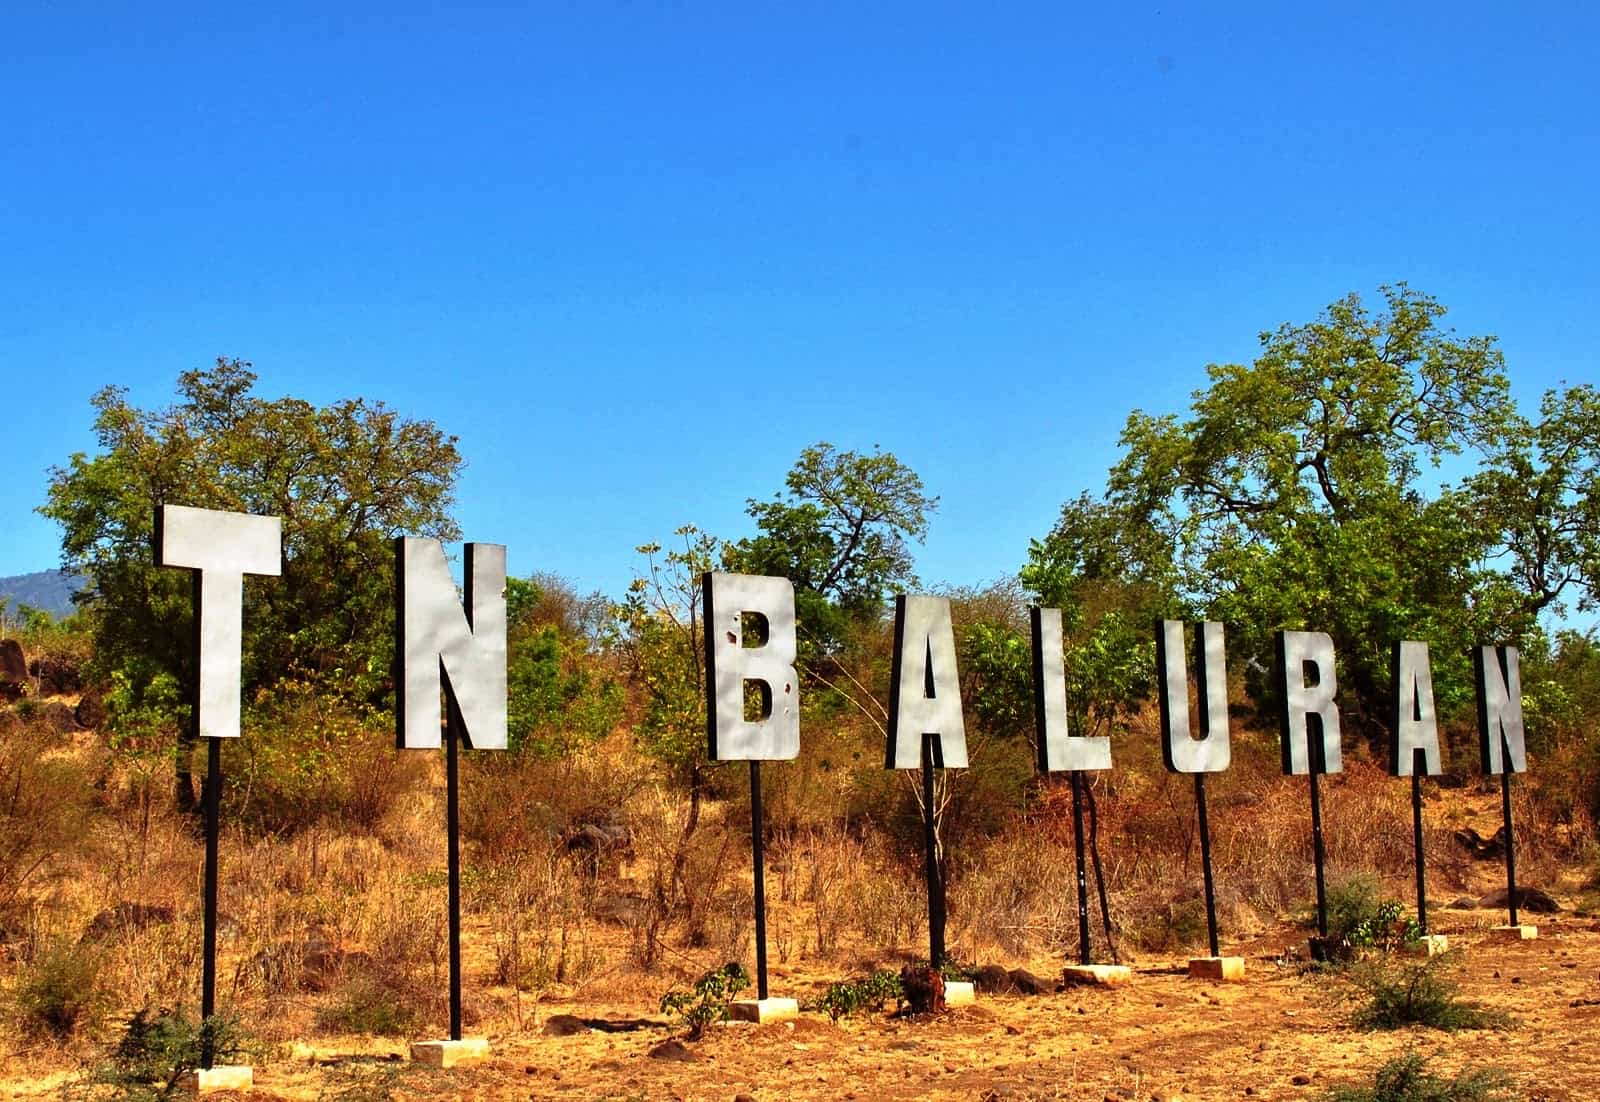 Merasakan Suasana Africa Van Java Taman Nasional Baluran Banyuwa Lokasi